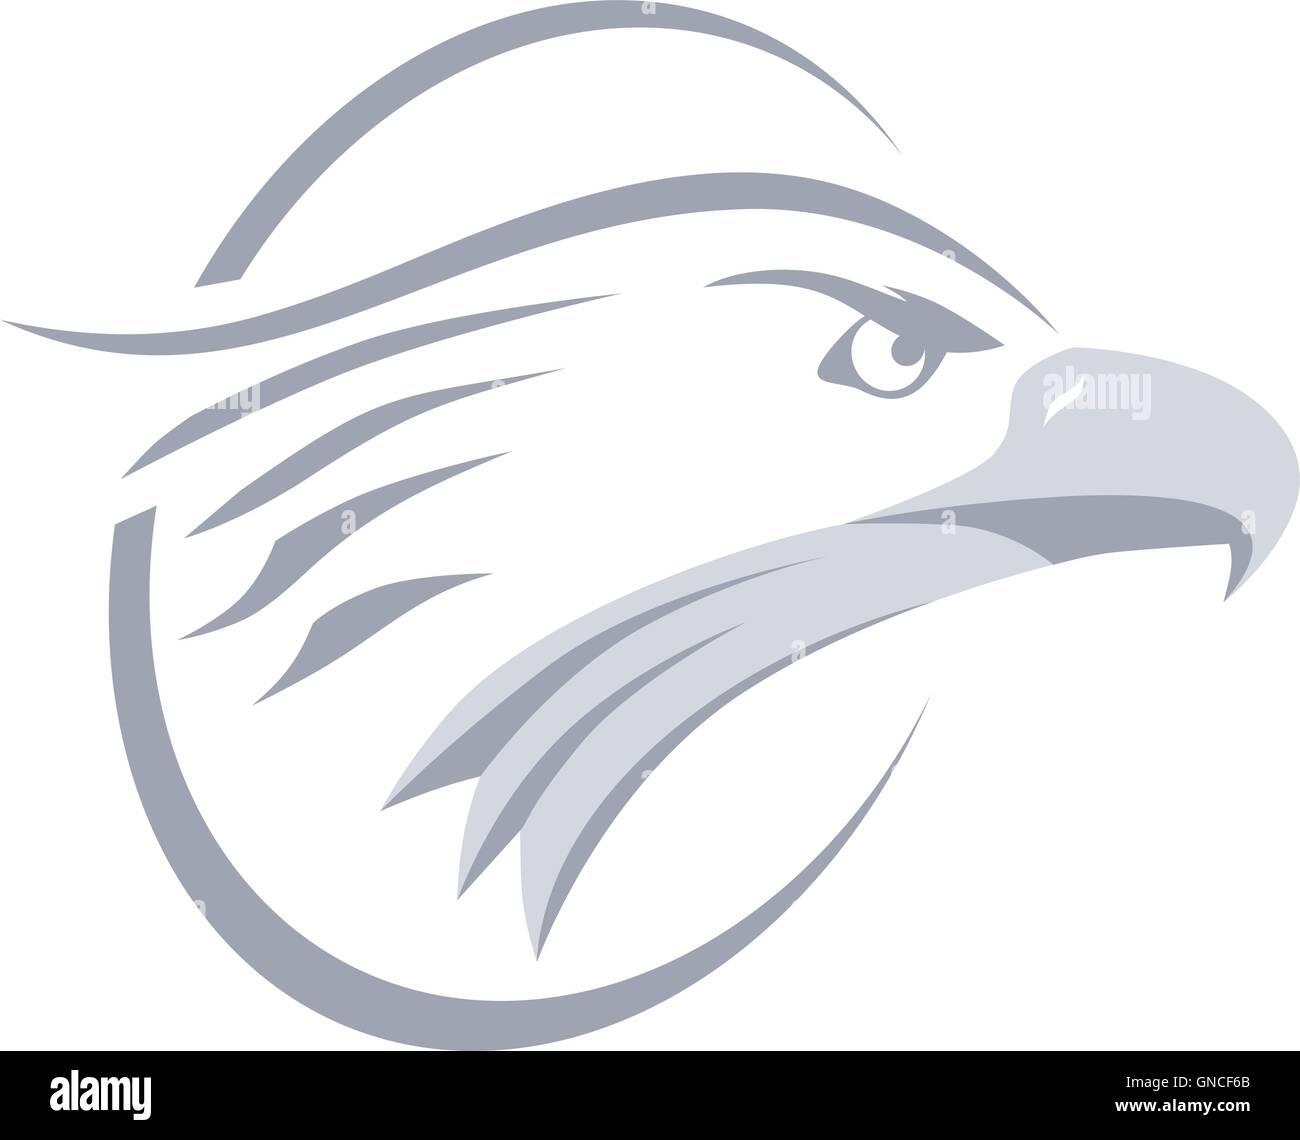 bold eagle template stock vector art illustration vector image